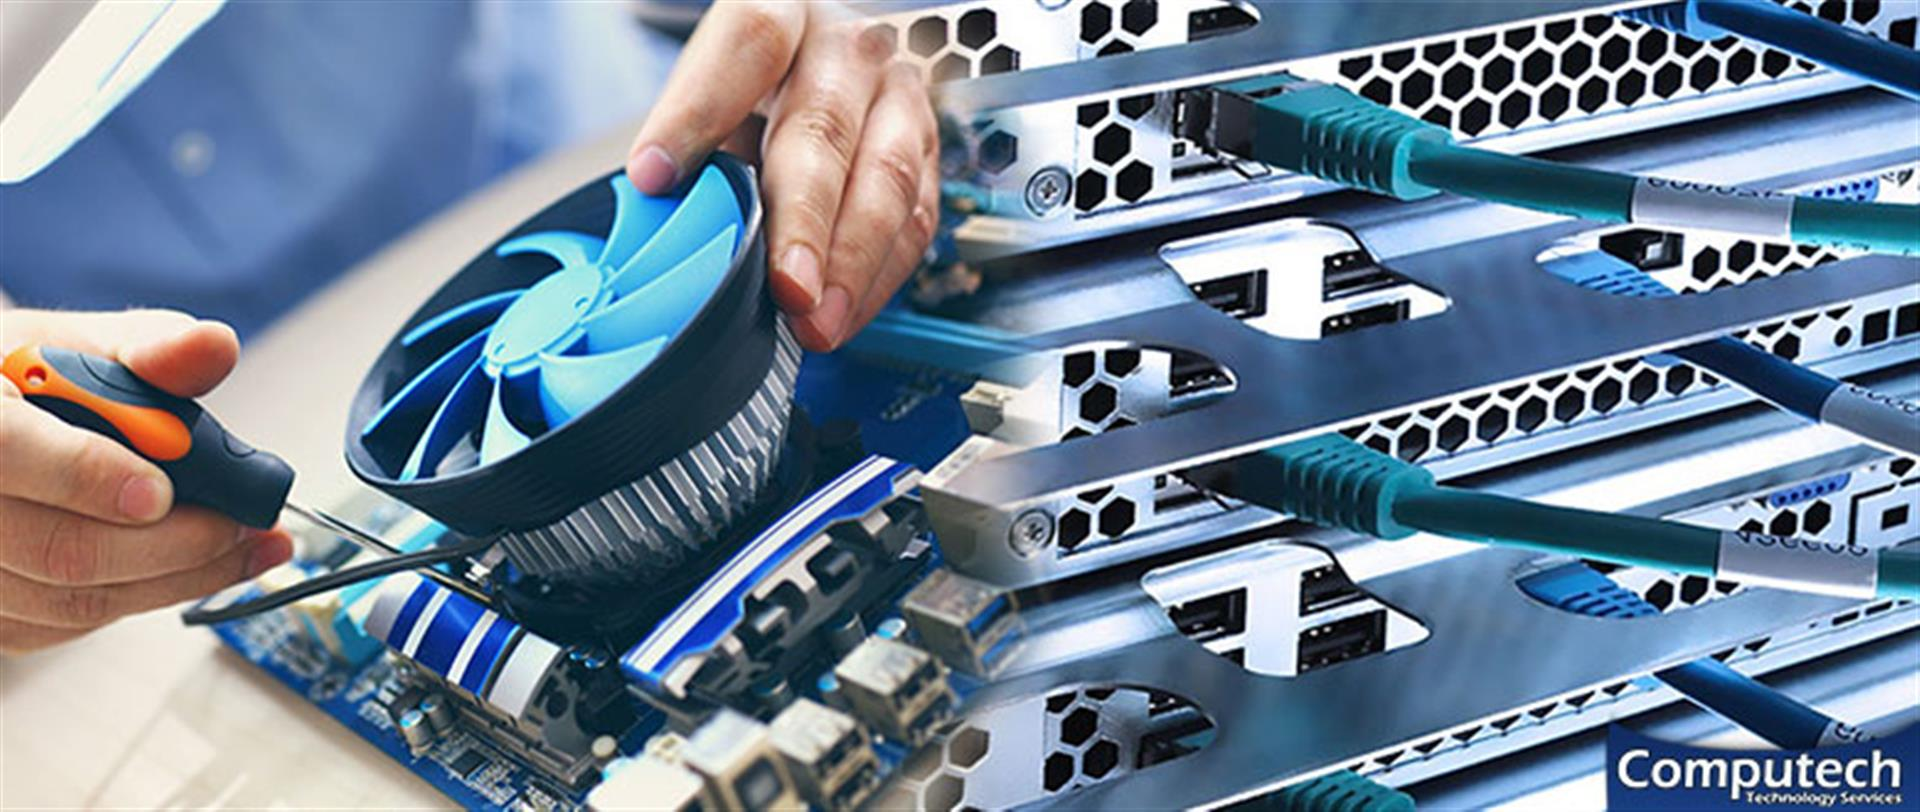 Ocilla Georgia On Site PC & Printer Repair, Network, Voice & Data Cabling Services